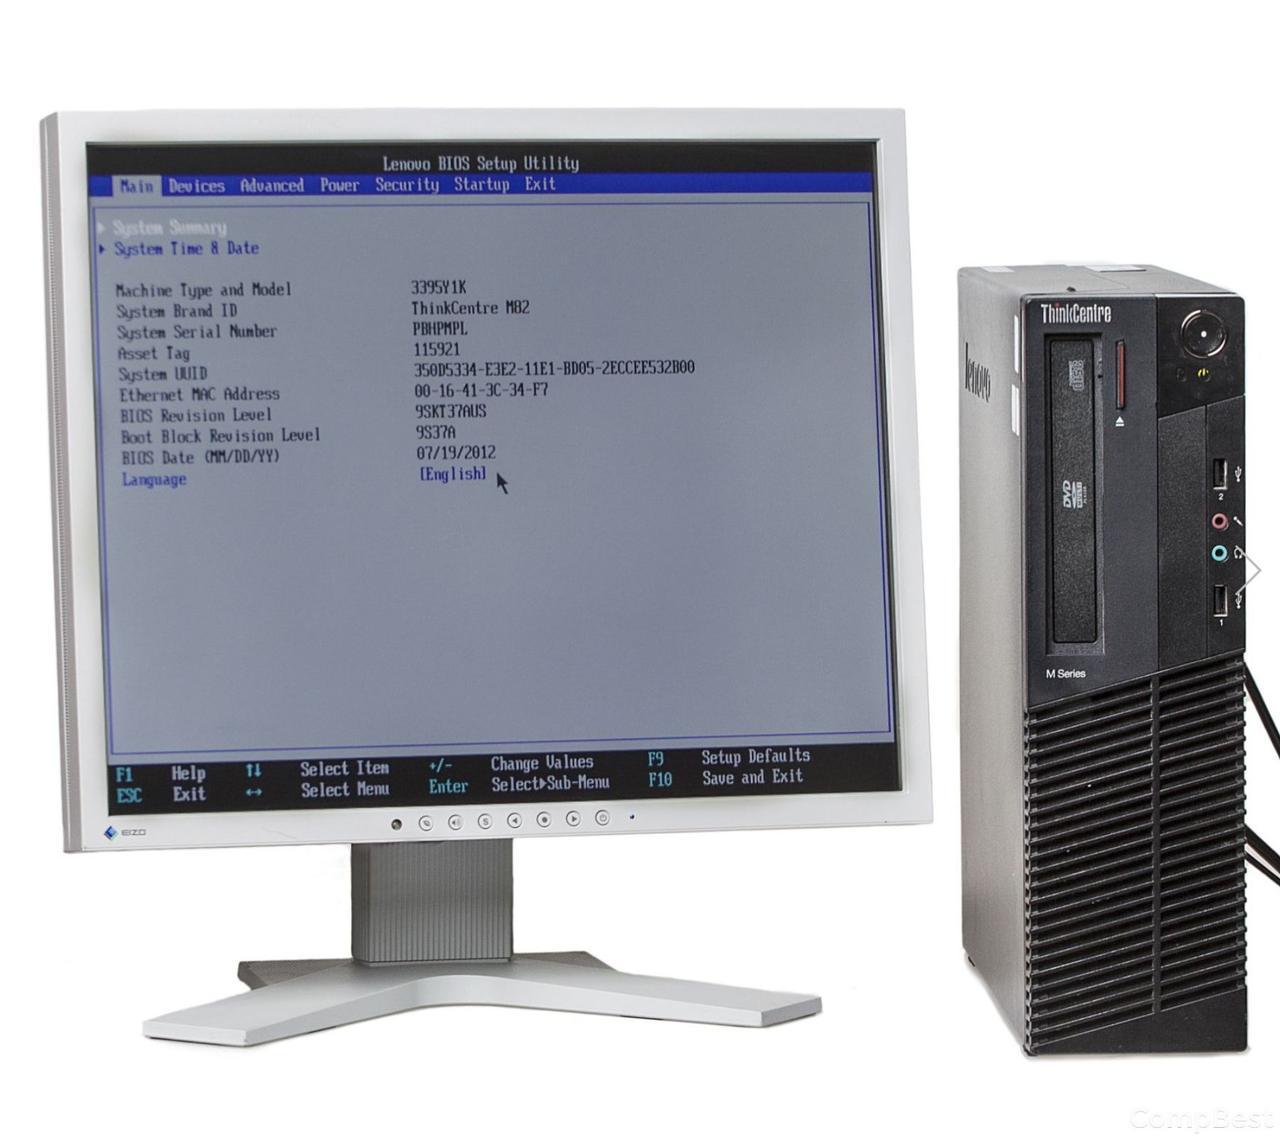 "Комплект: Lenovo m82 Desktop / Intel Core i3-2120 (2(4)ядра по 3.30GHz) / 8 GB DDR3 / 250 GB HDD + Монитор Eizo FlexScan S1921 / 19"" / 1280x1024 S-PVA"